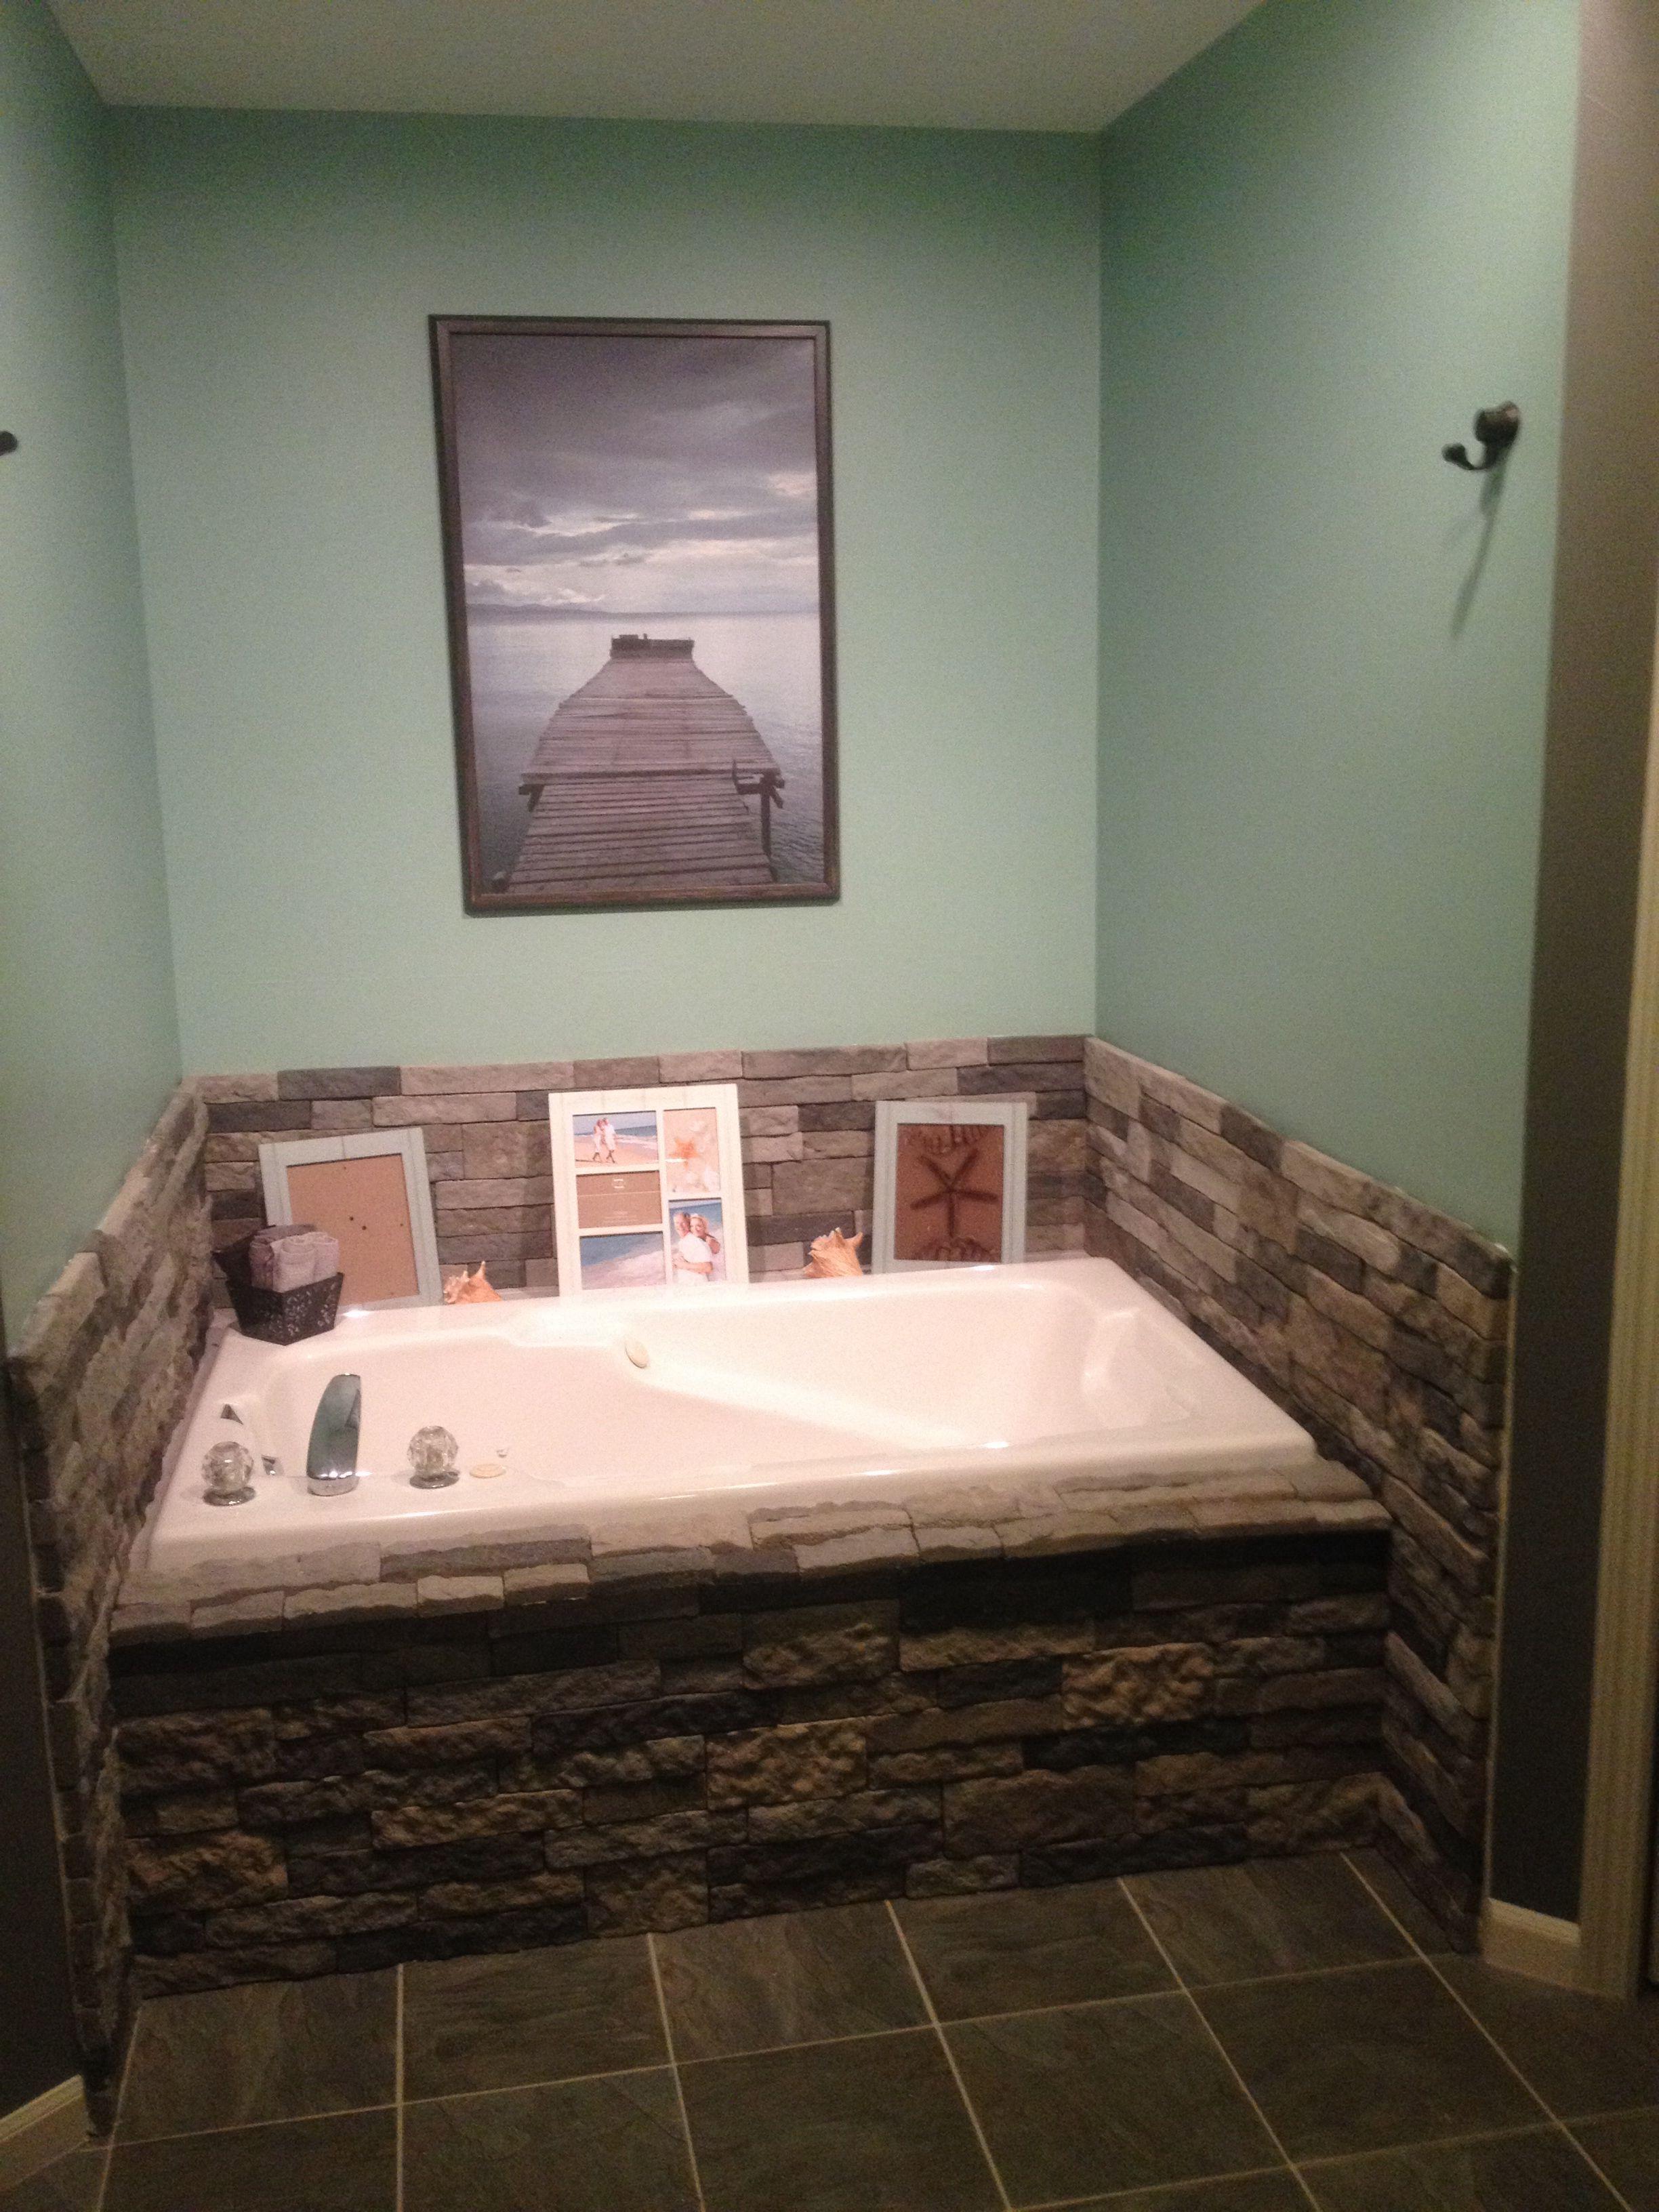 Fantastic Airstone Accent Wall Bathroom - d271bc866bd1f5a2401f9dd980715416  Pictures_694913.jpg